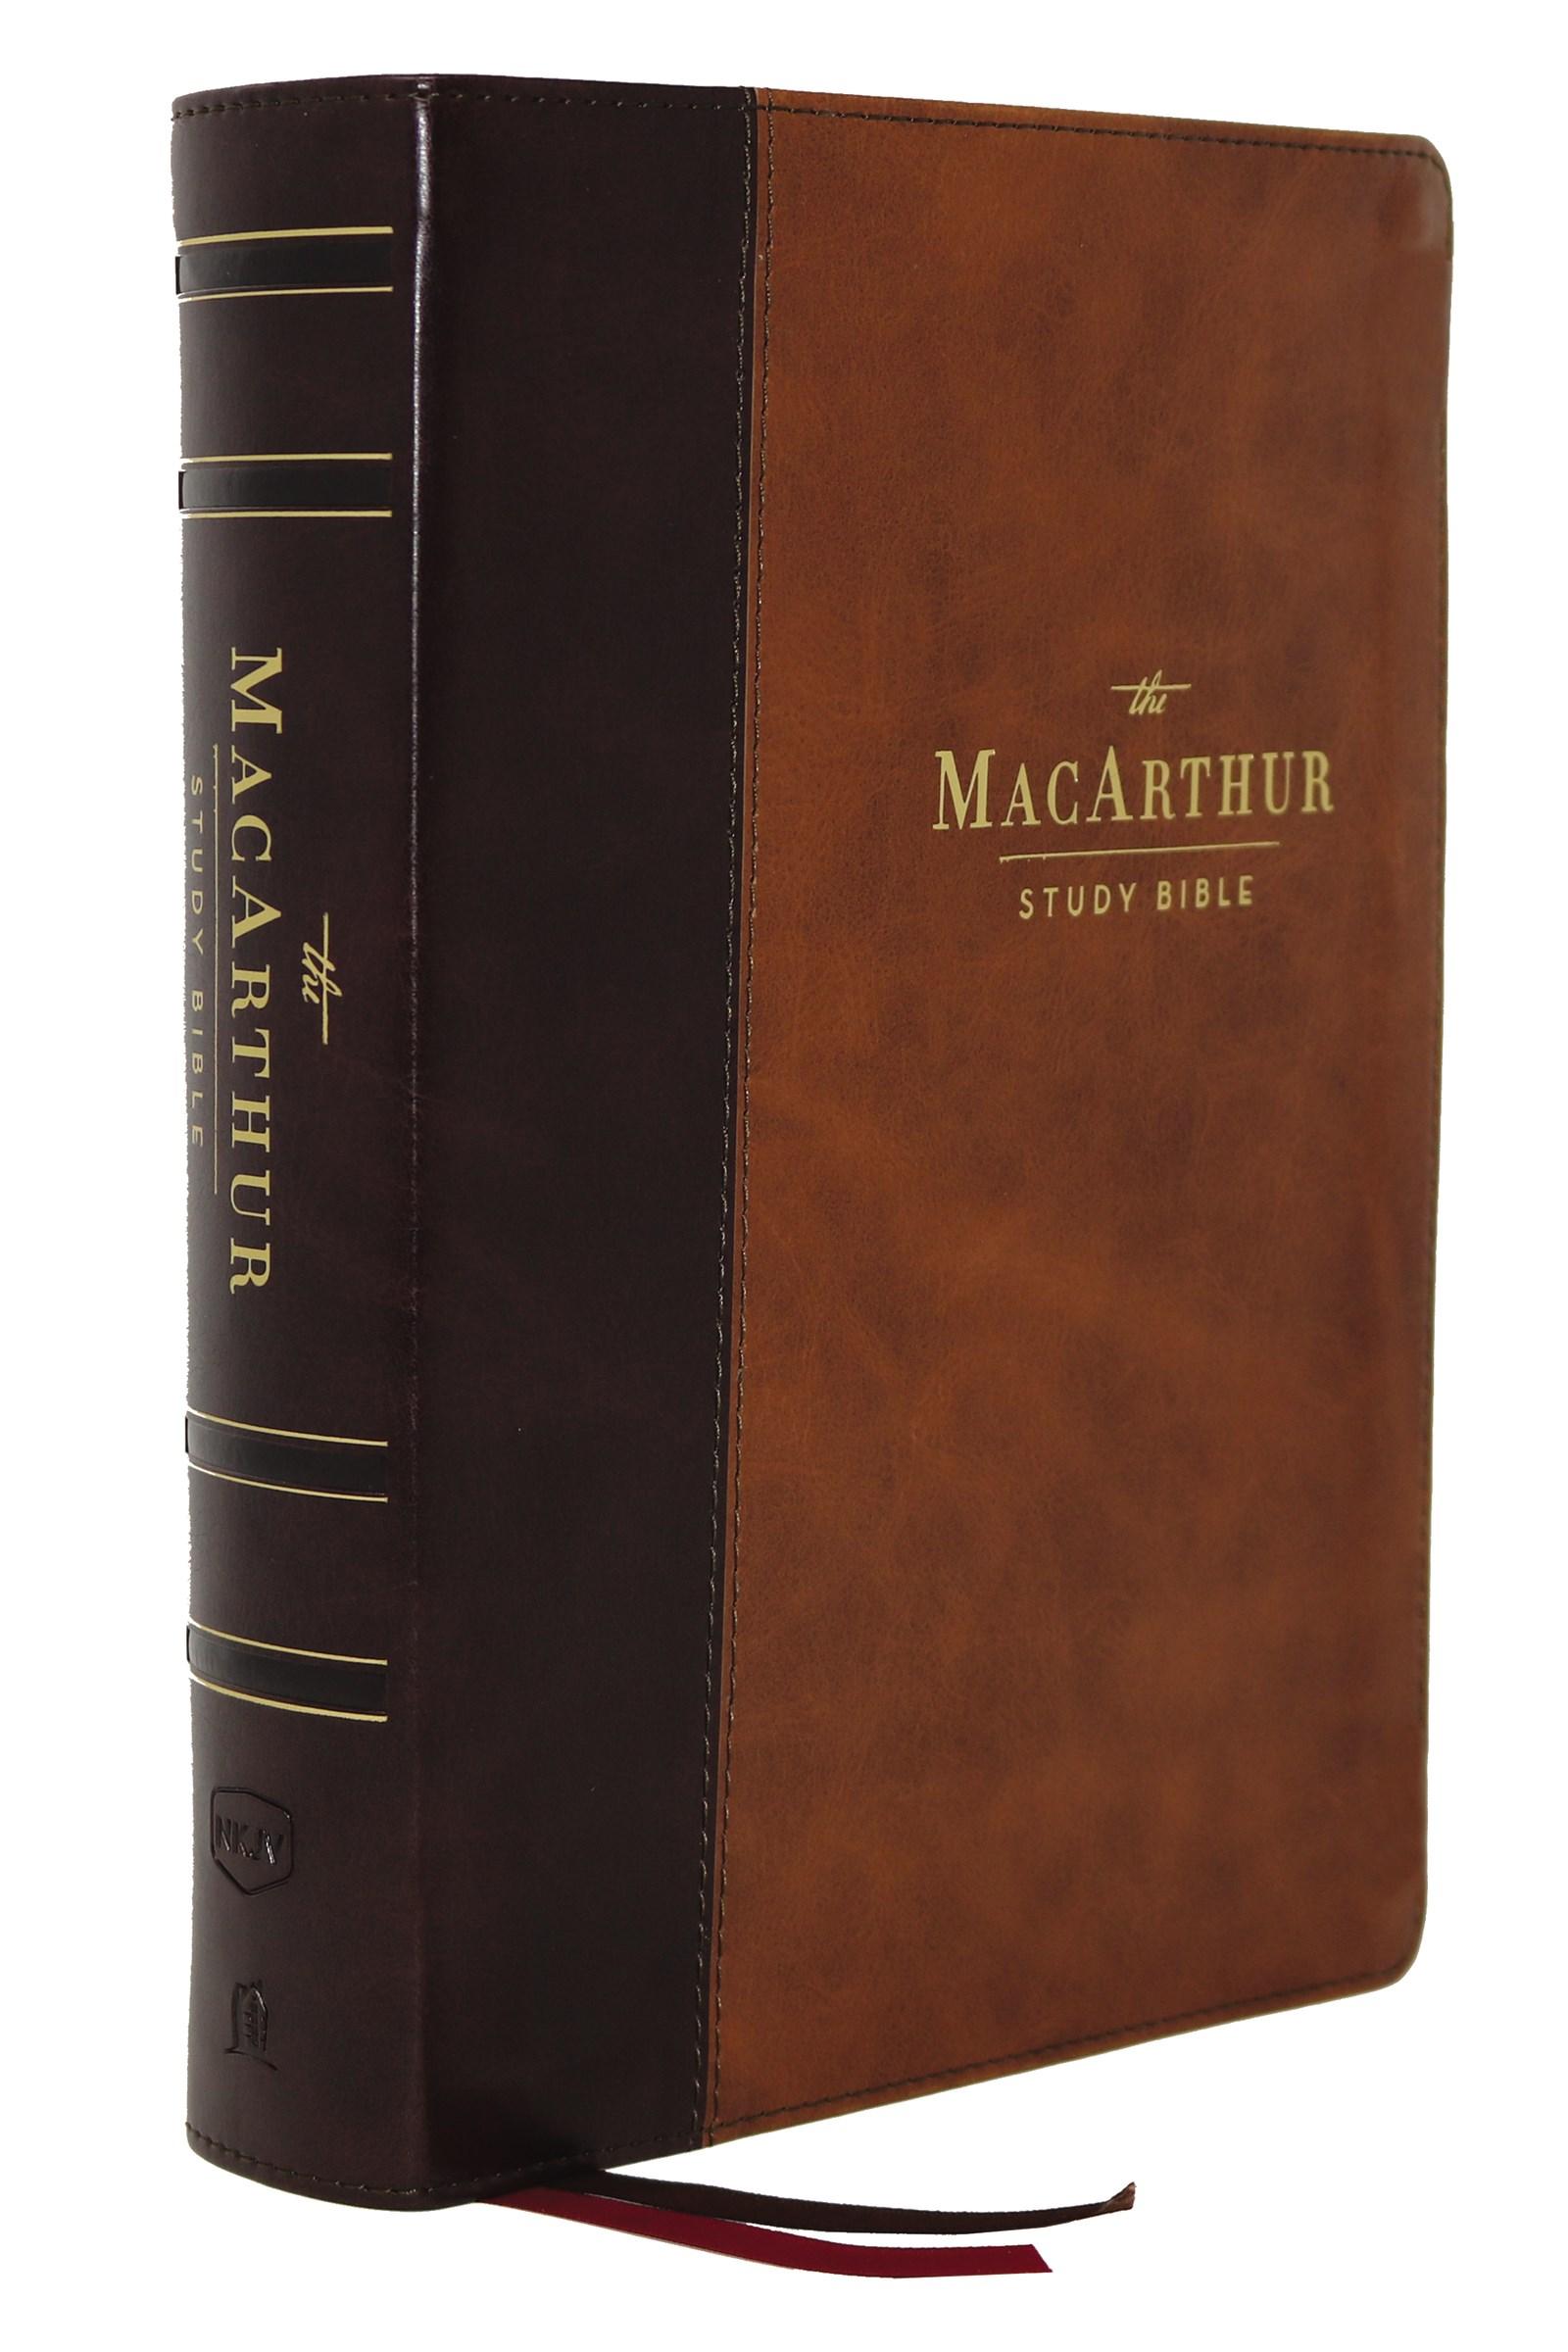 NKJV MacArthur Study Bible (2nd Edition) (Comfort Print)-Brown Leathersoft